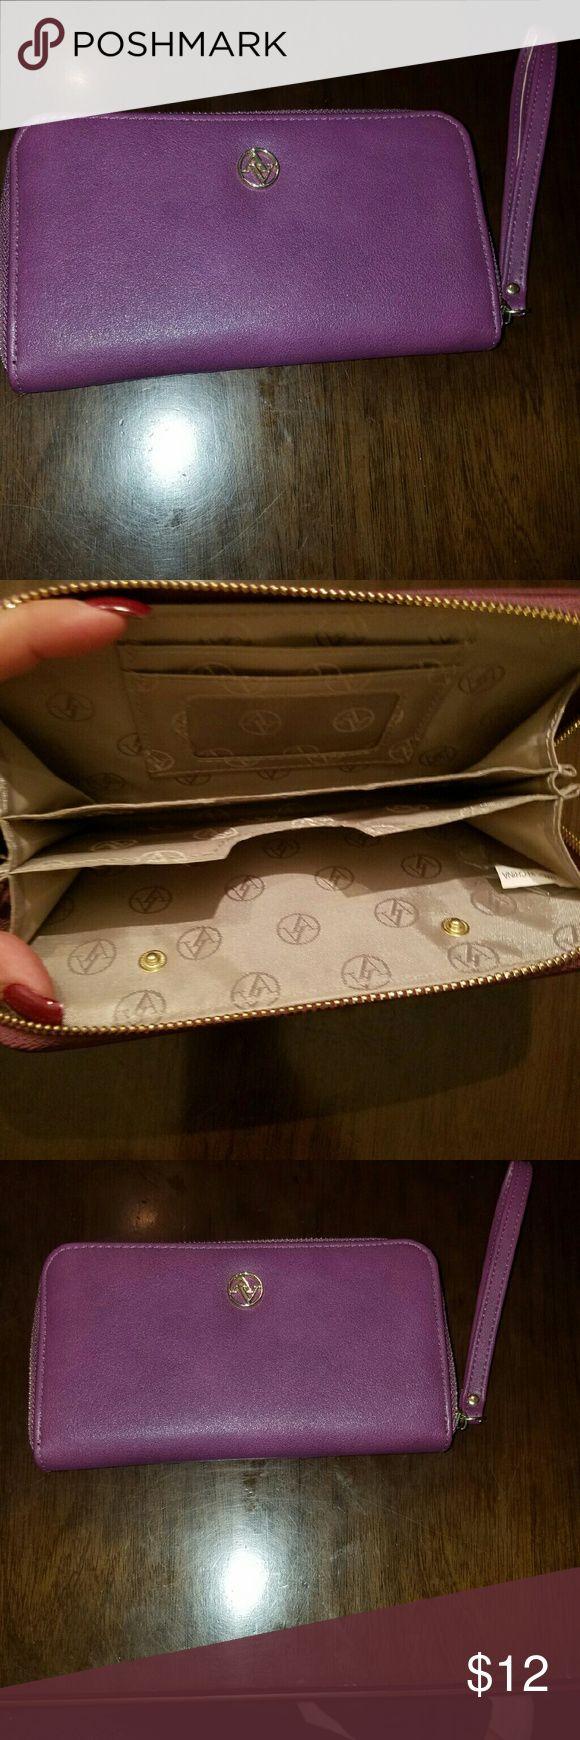 Adrienne Vittadini Wallet Purple wallet in great condition. Adrienne Vittadini Accessories